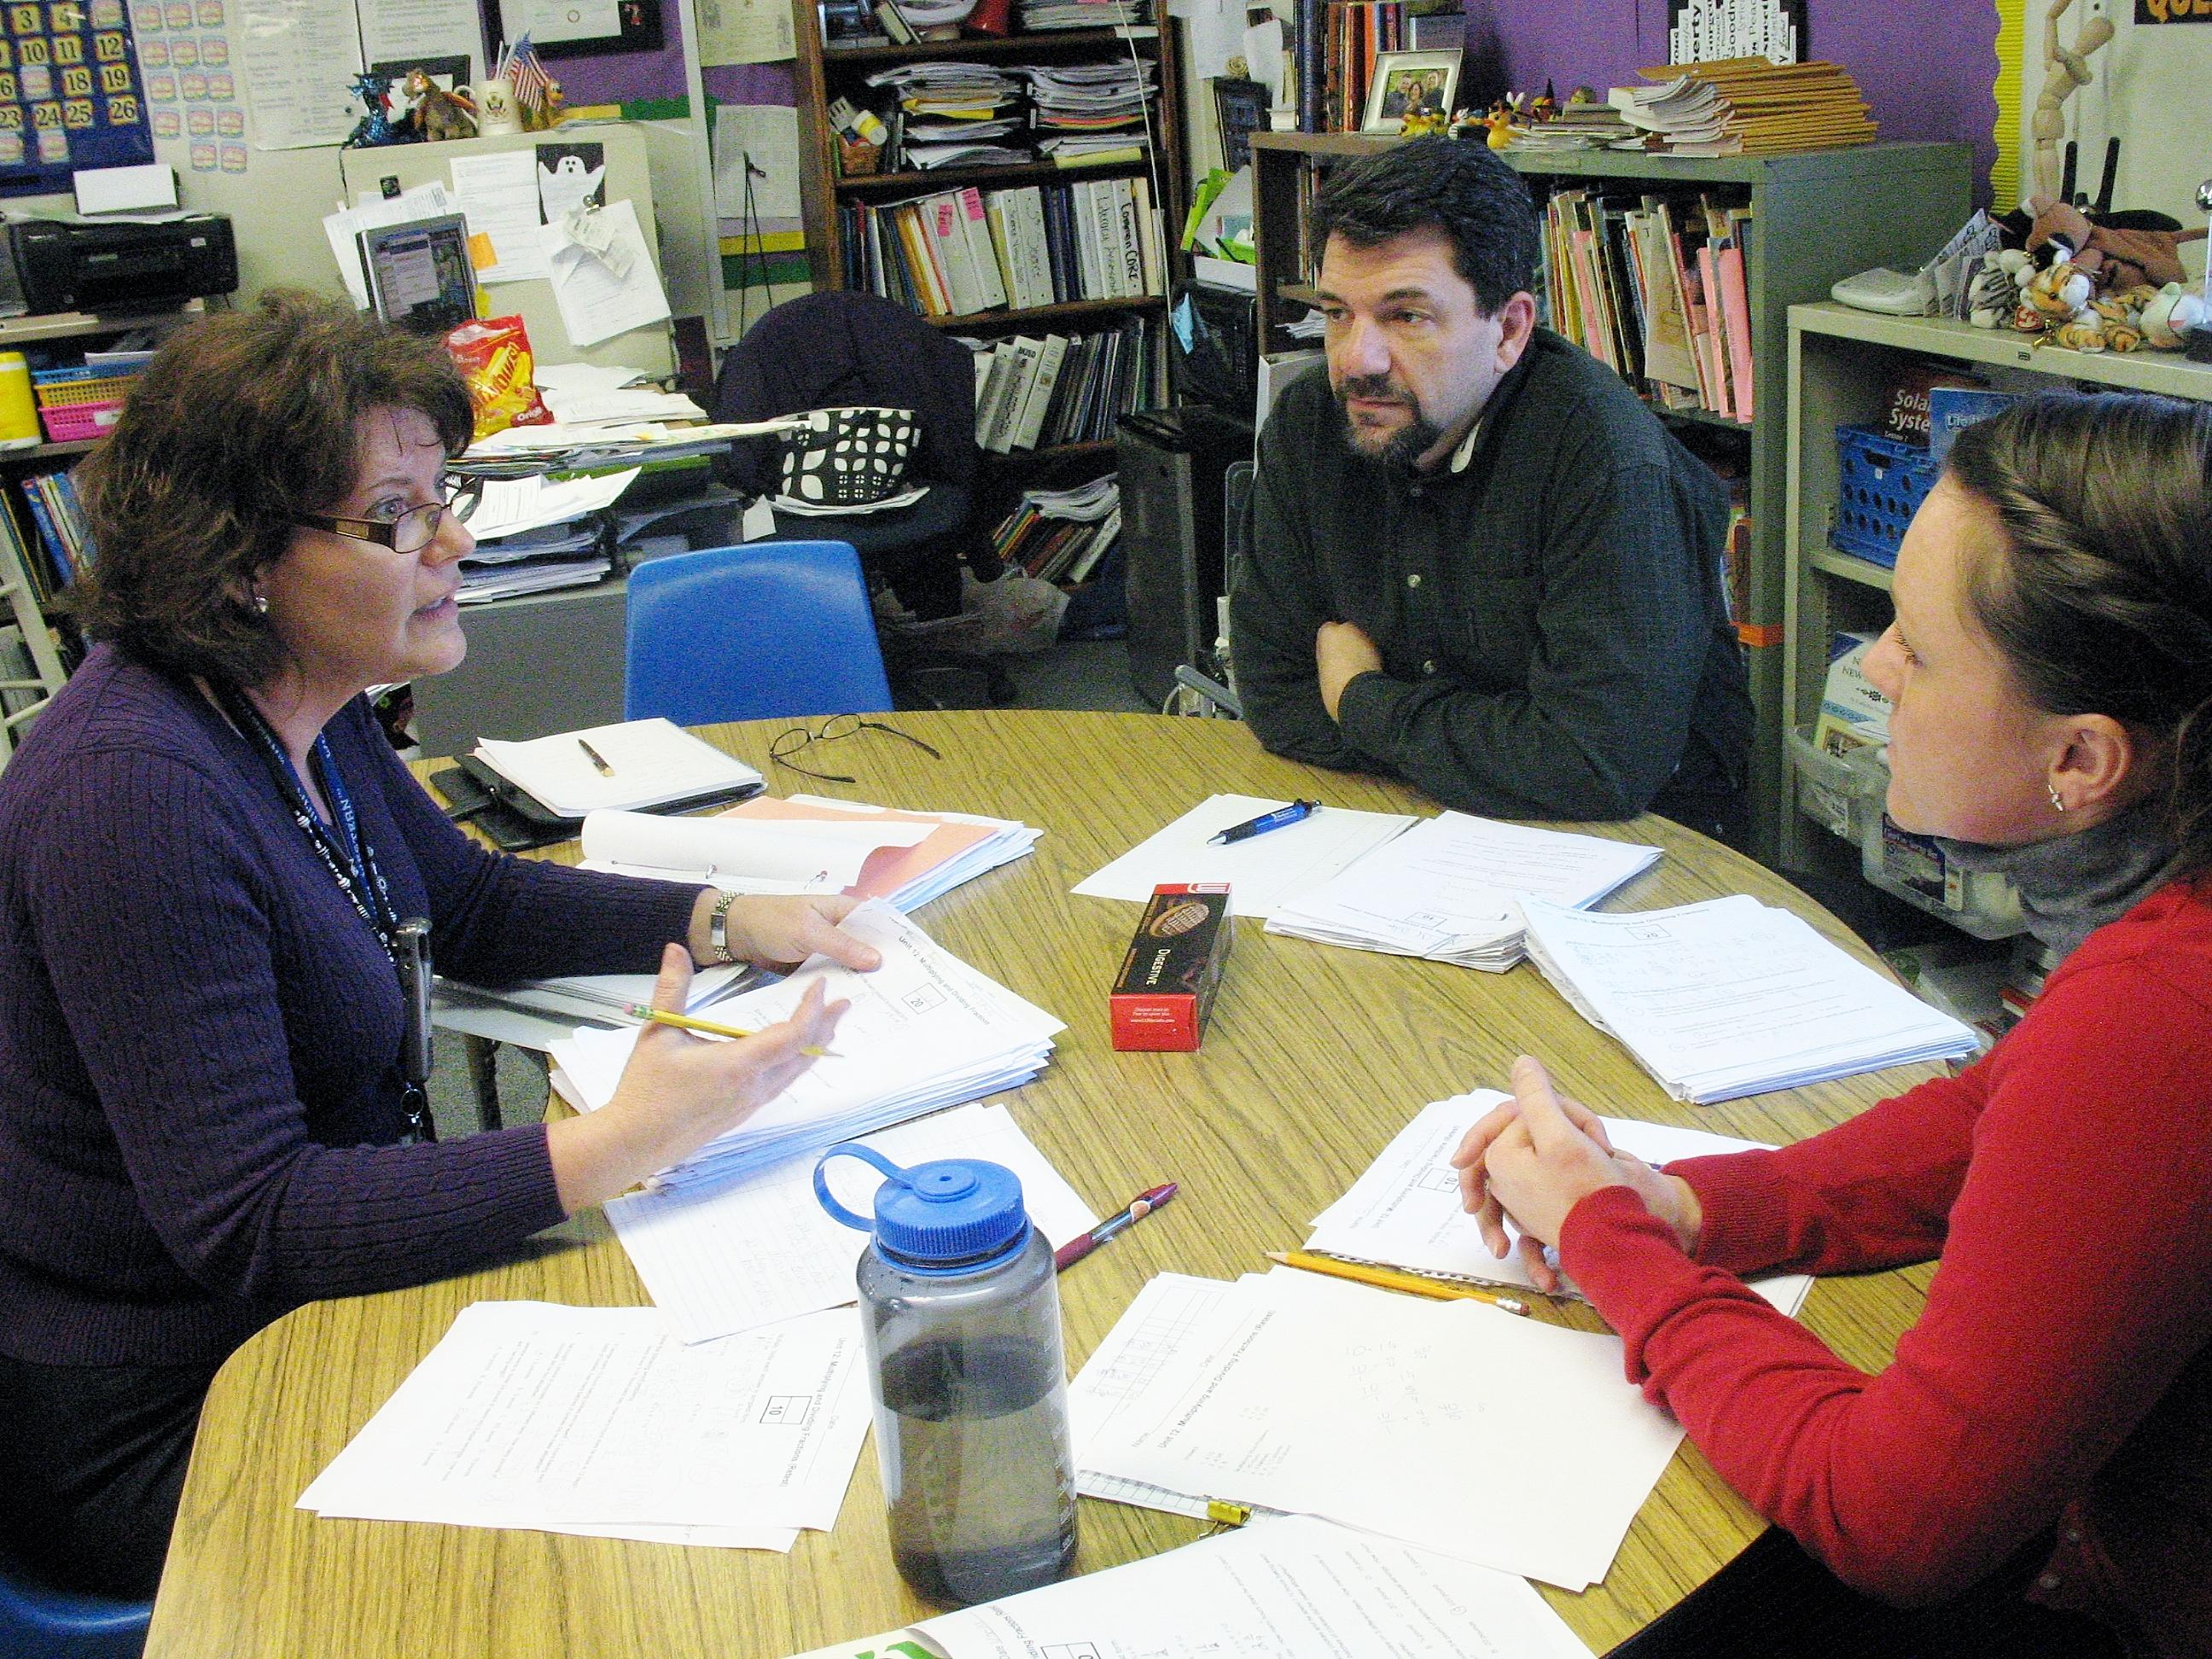 Collaborative Teaching High School ~ Collaboration days provide enrichment for dublin teachers